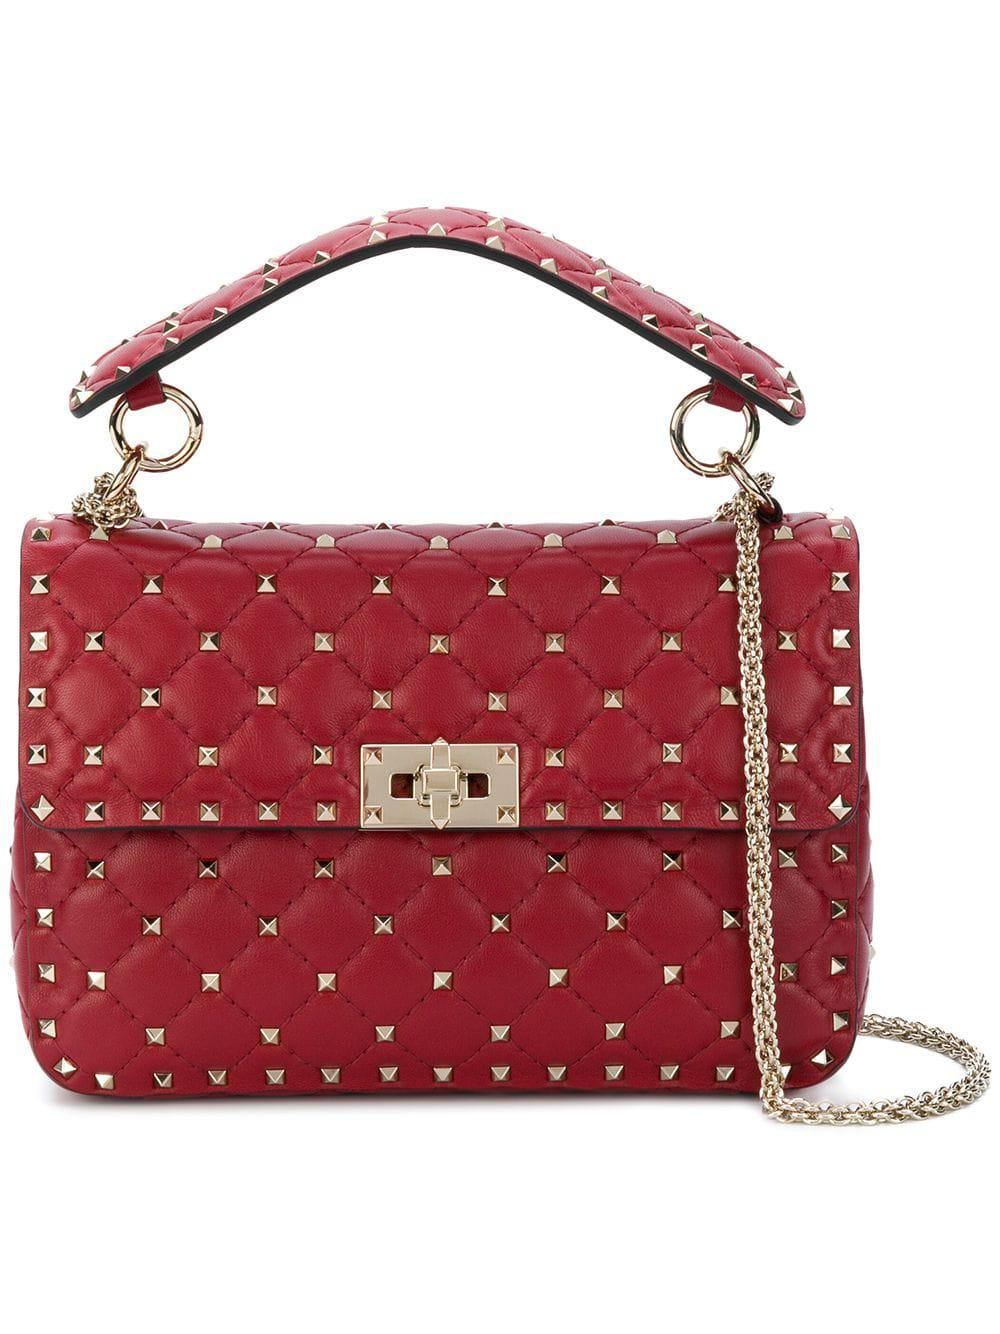 17039a190531 Lyst - Valentino Garavani Rockstud Spike Crossbody Bag in Red - Save 43%